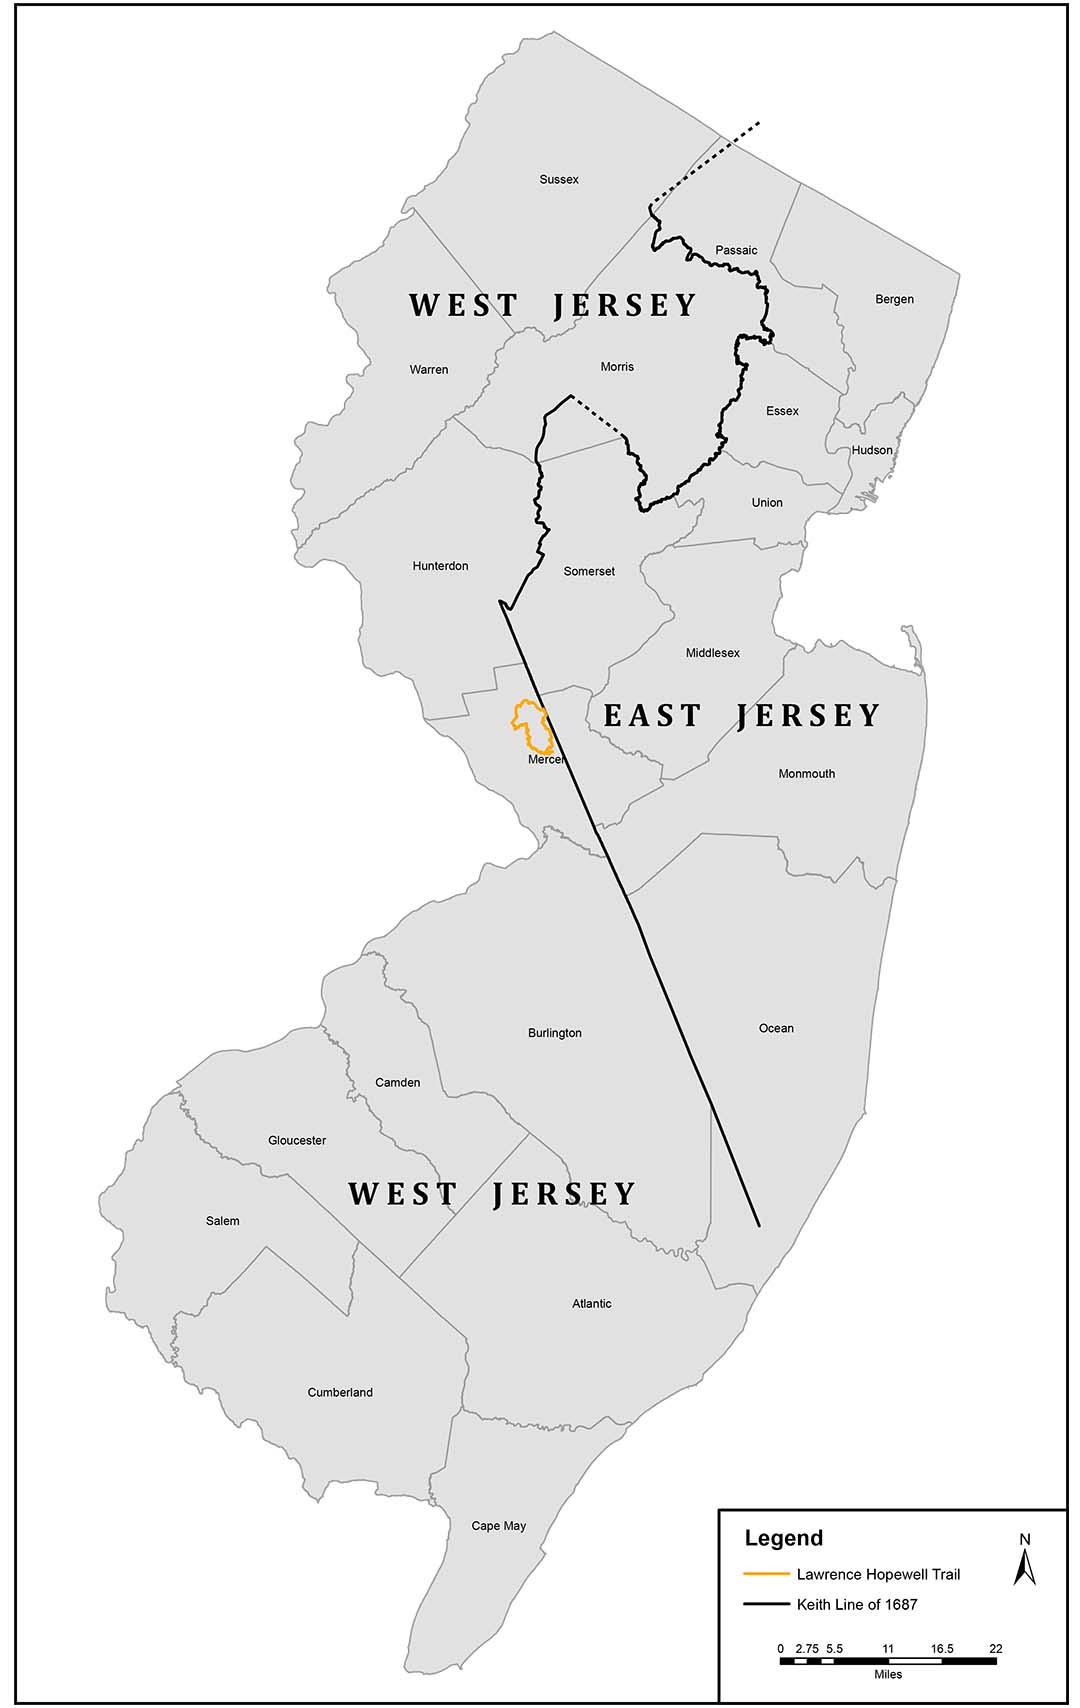 LHT Province Line Keith Line Digitization